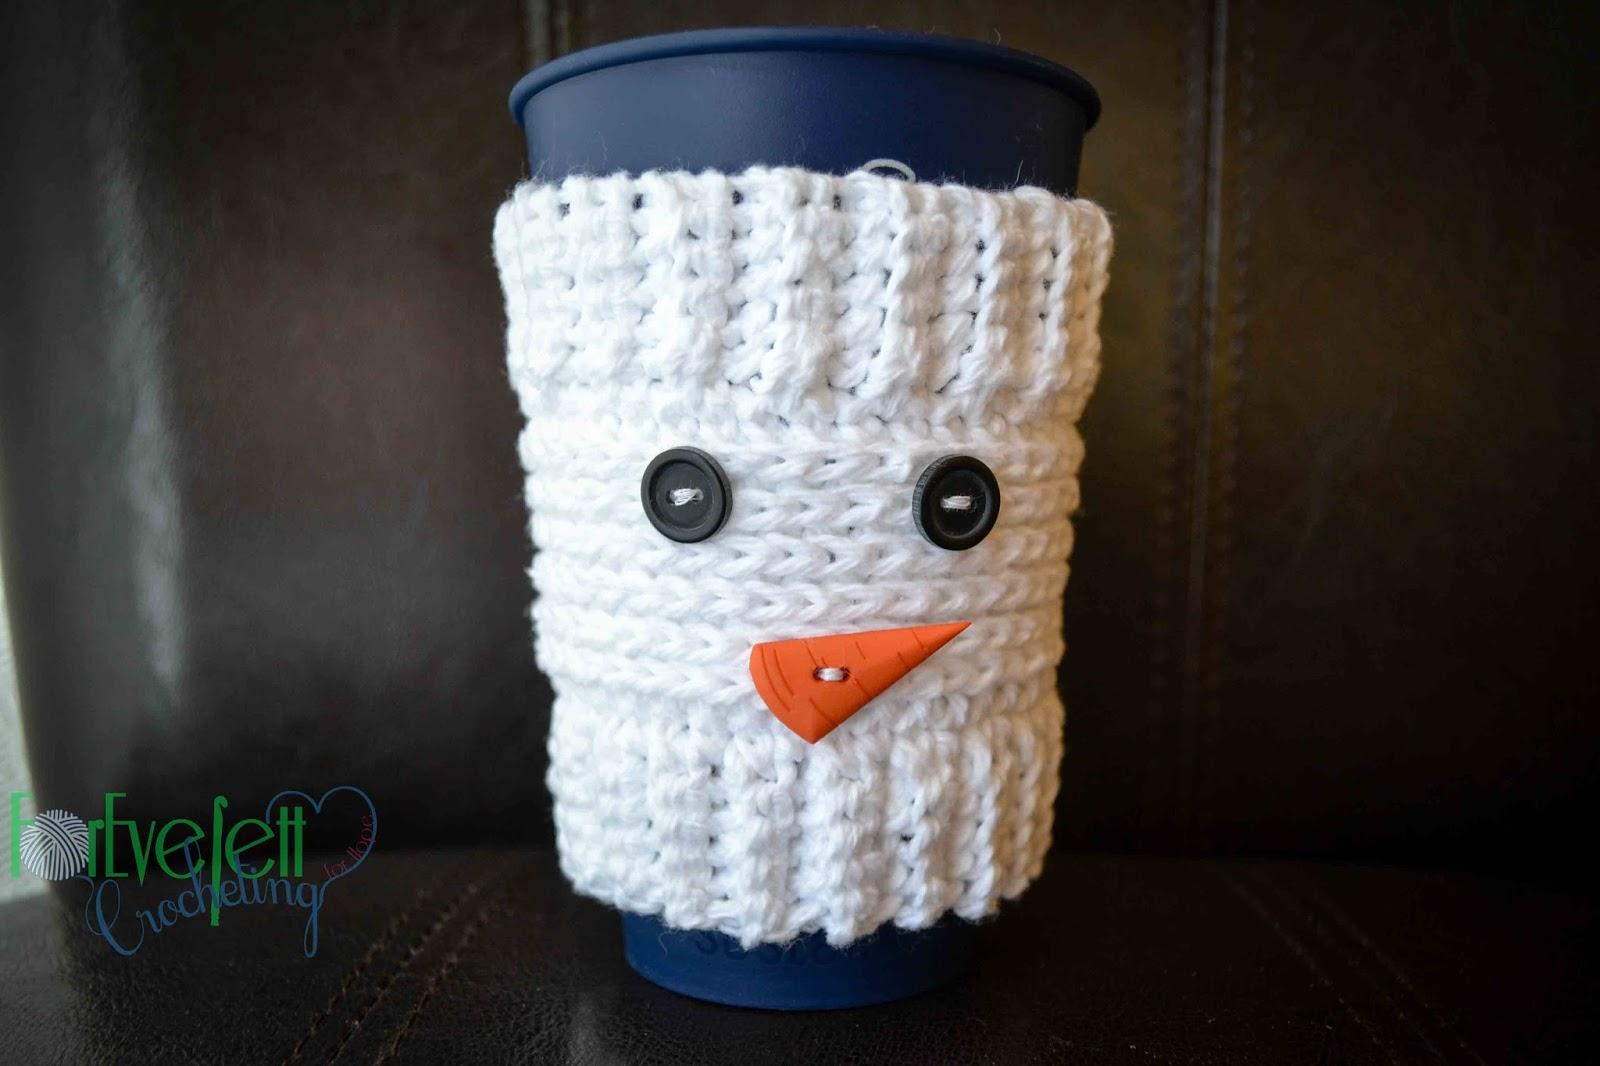 Foreverettcrocheting Free Snowman Cup Cozy Crochet Pattern